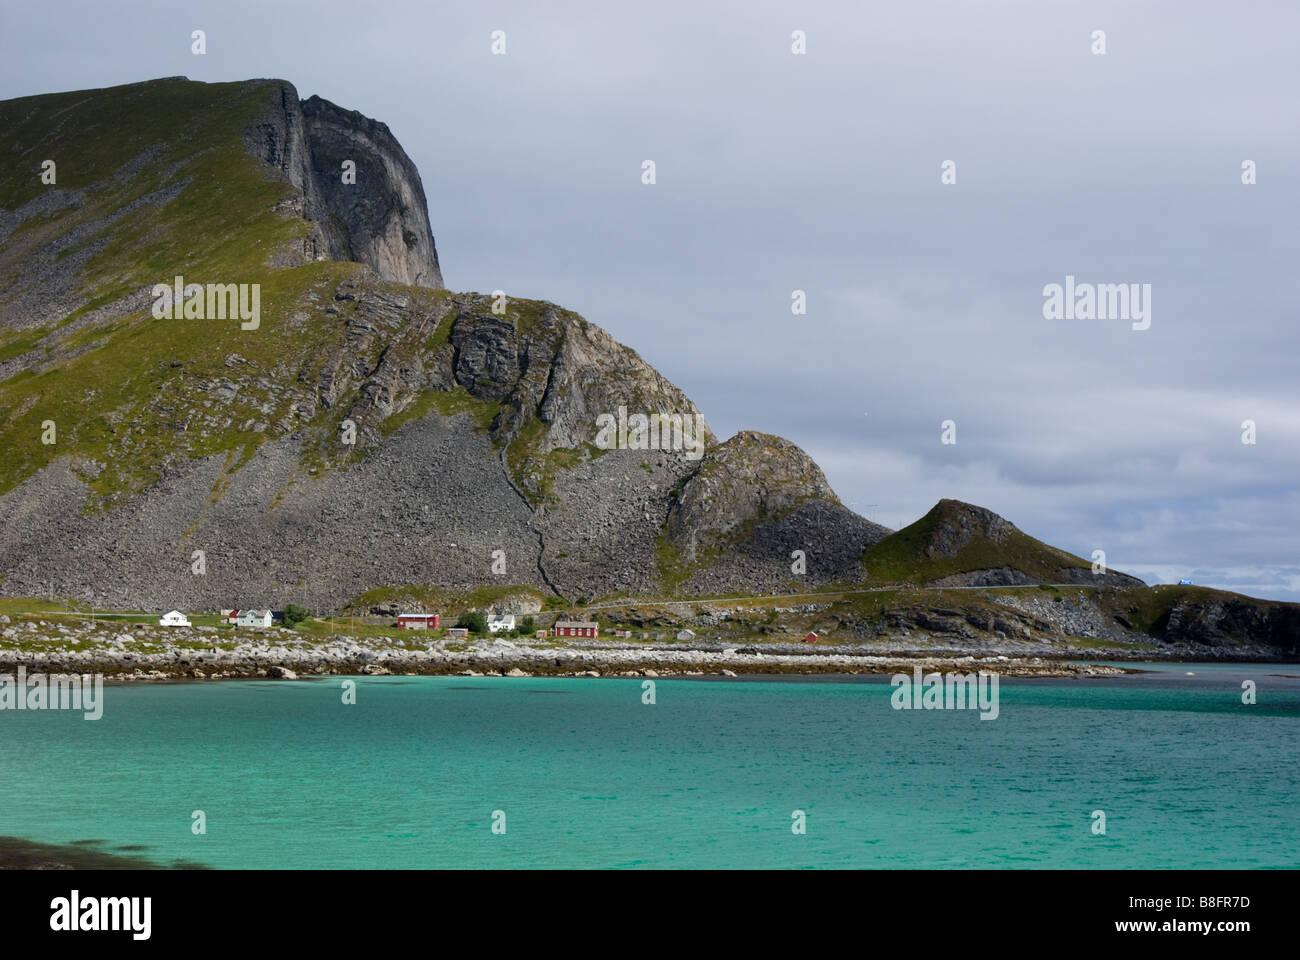 Bay halfway from Sørland to Nordland, Værøy, Lofoten, Nordland, Norway, Scandinavia - Stock Image